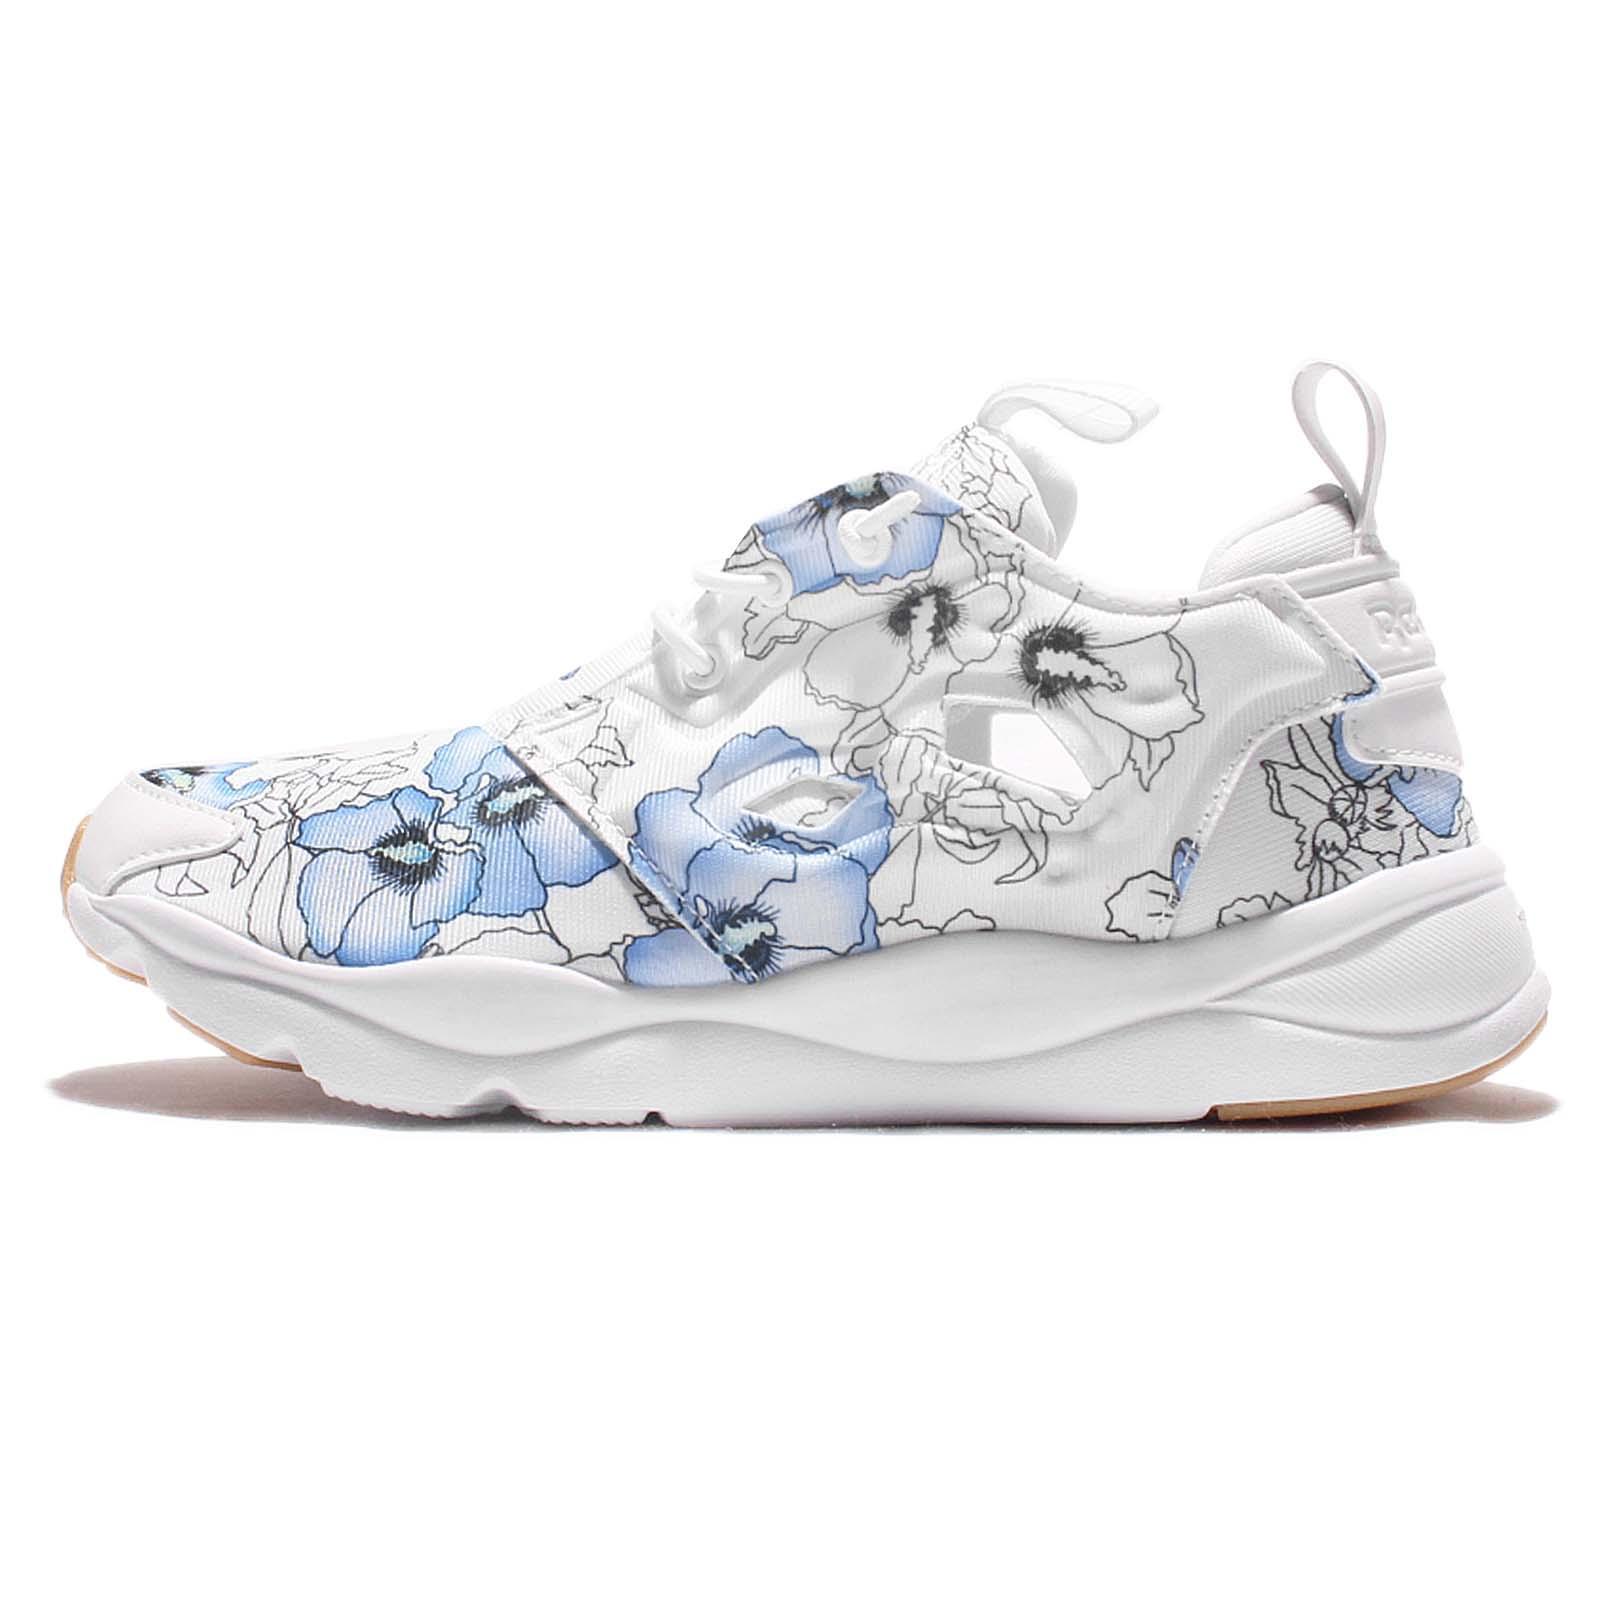 626330a32252 Reebok Furylite FG Floral Bloom Rose of Sharon White Blue Women Shoes BD1098